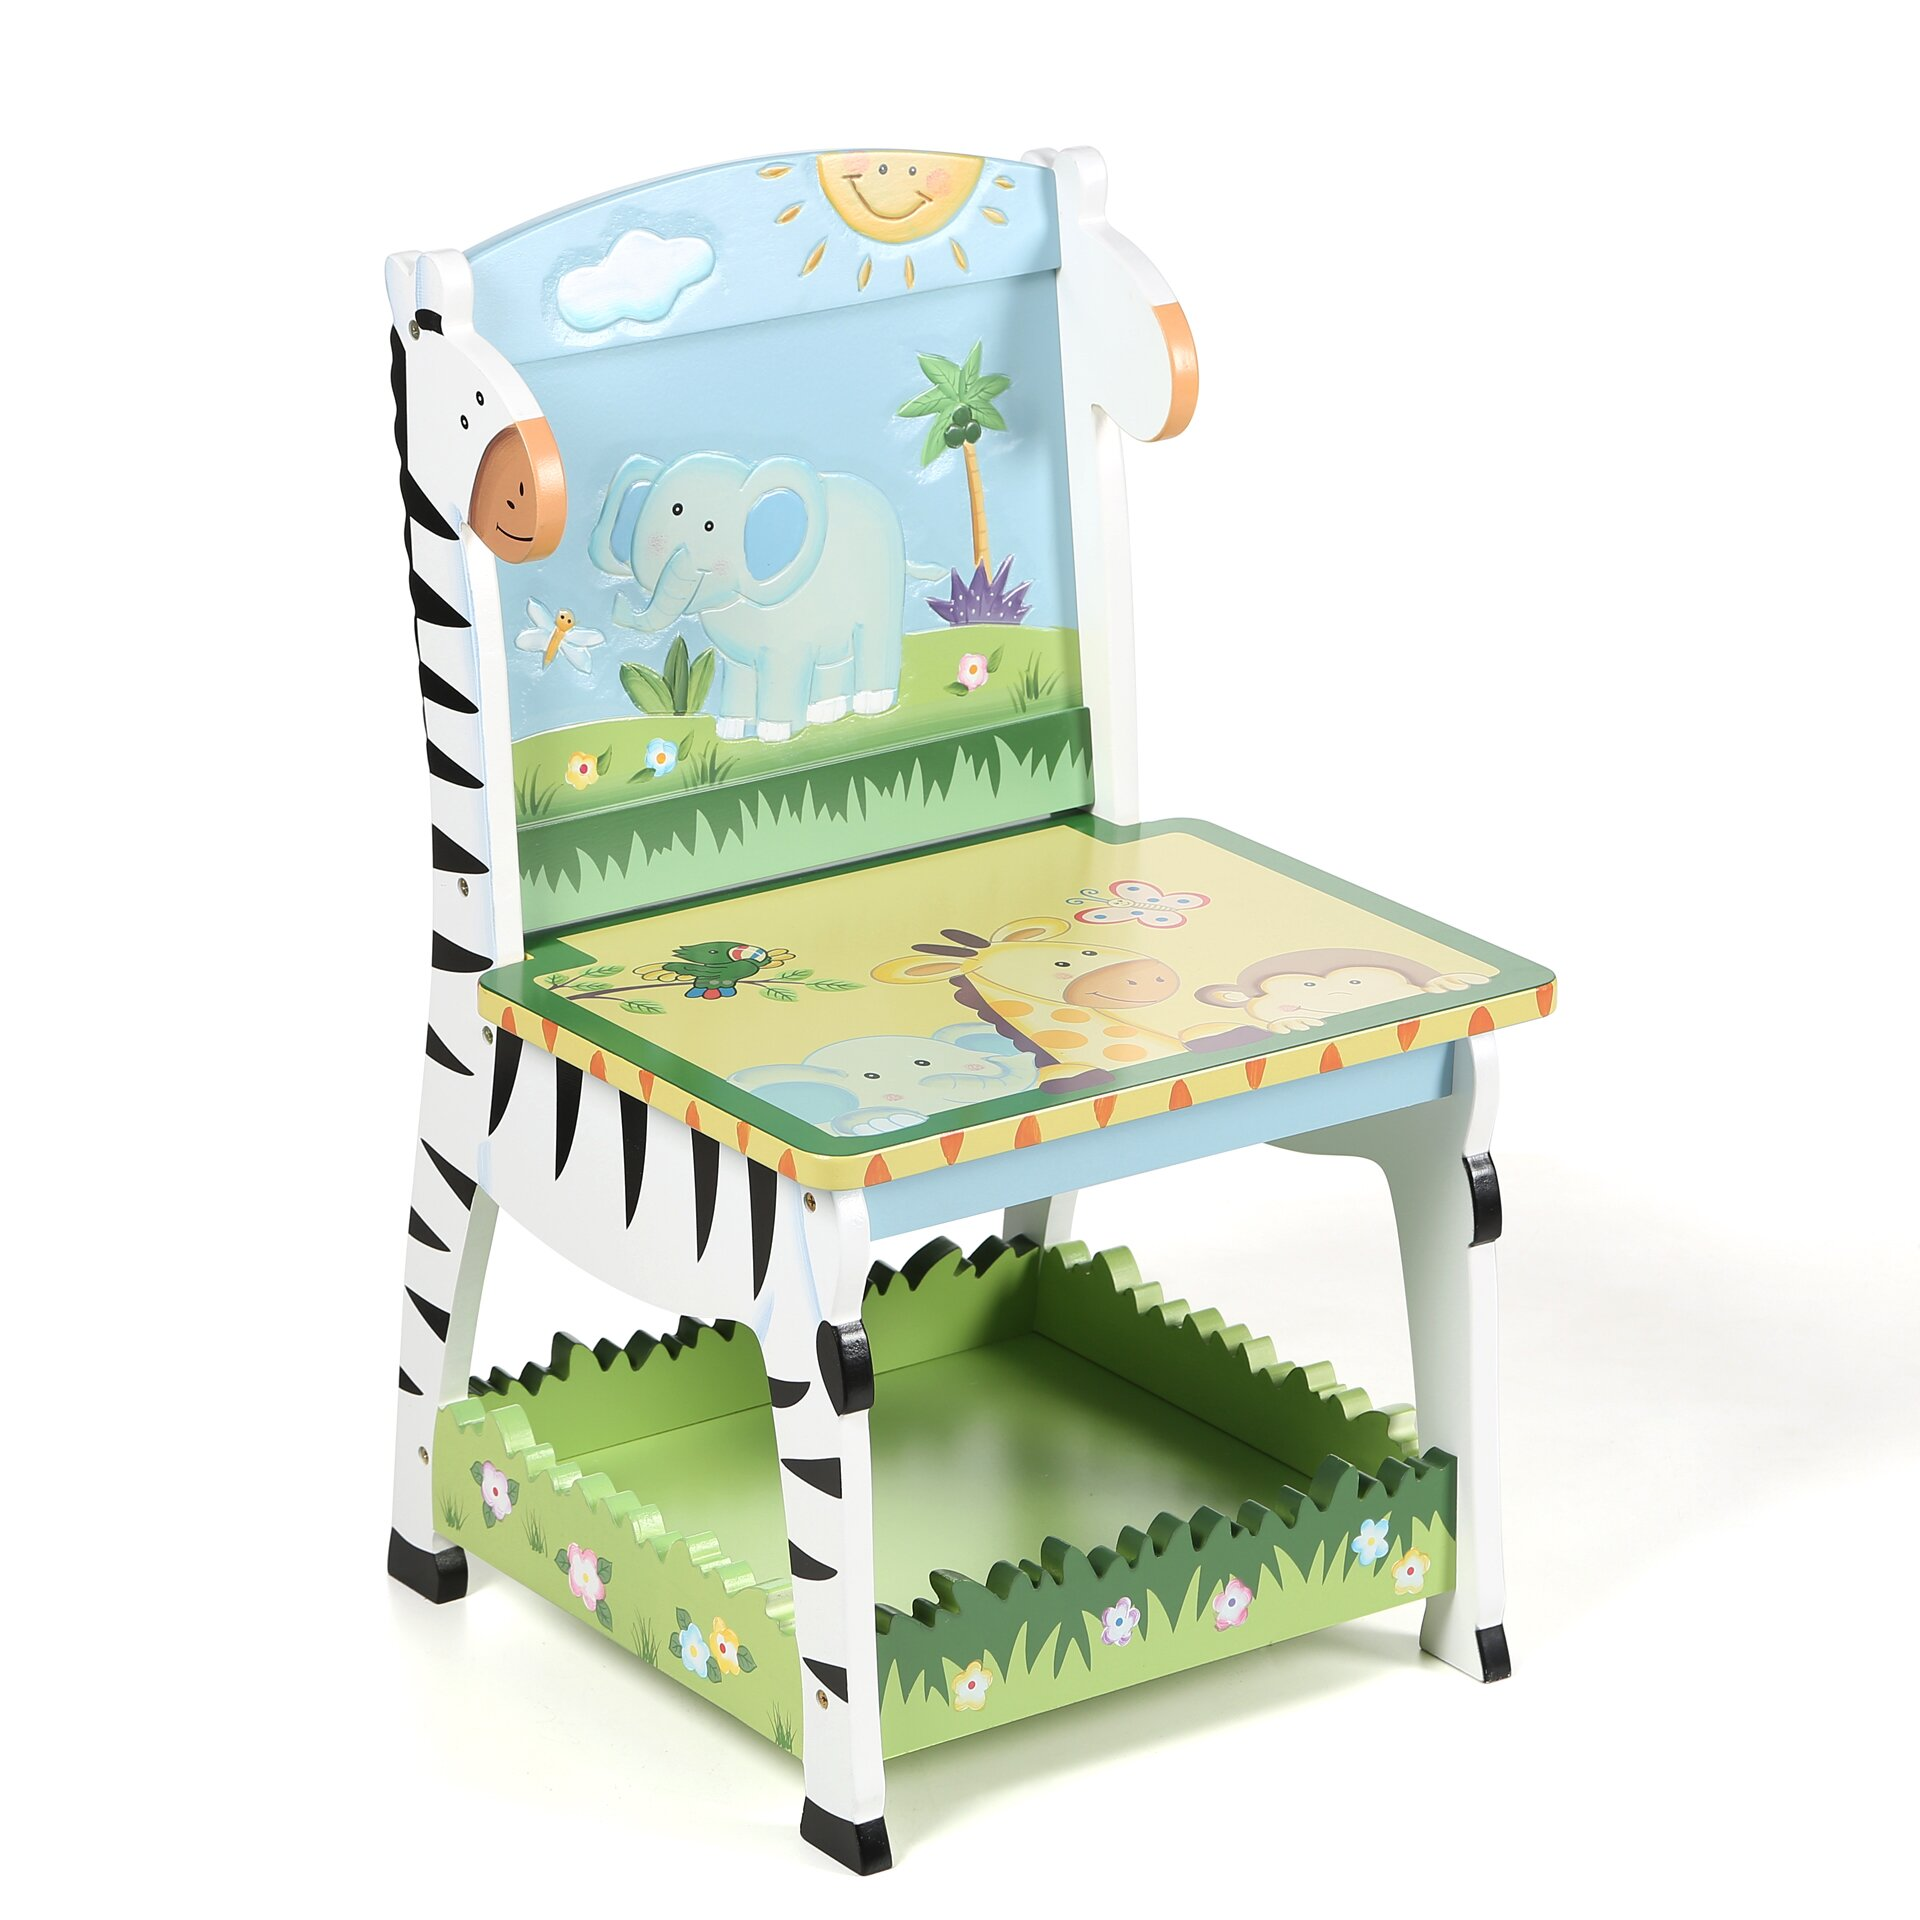 fantasy fields sunny safari kids desk chair bedroompicturesque comfortable desk chairs enjoy work